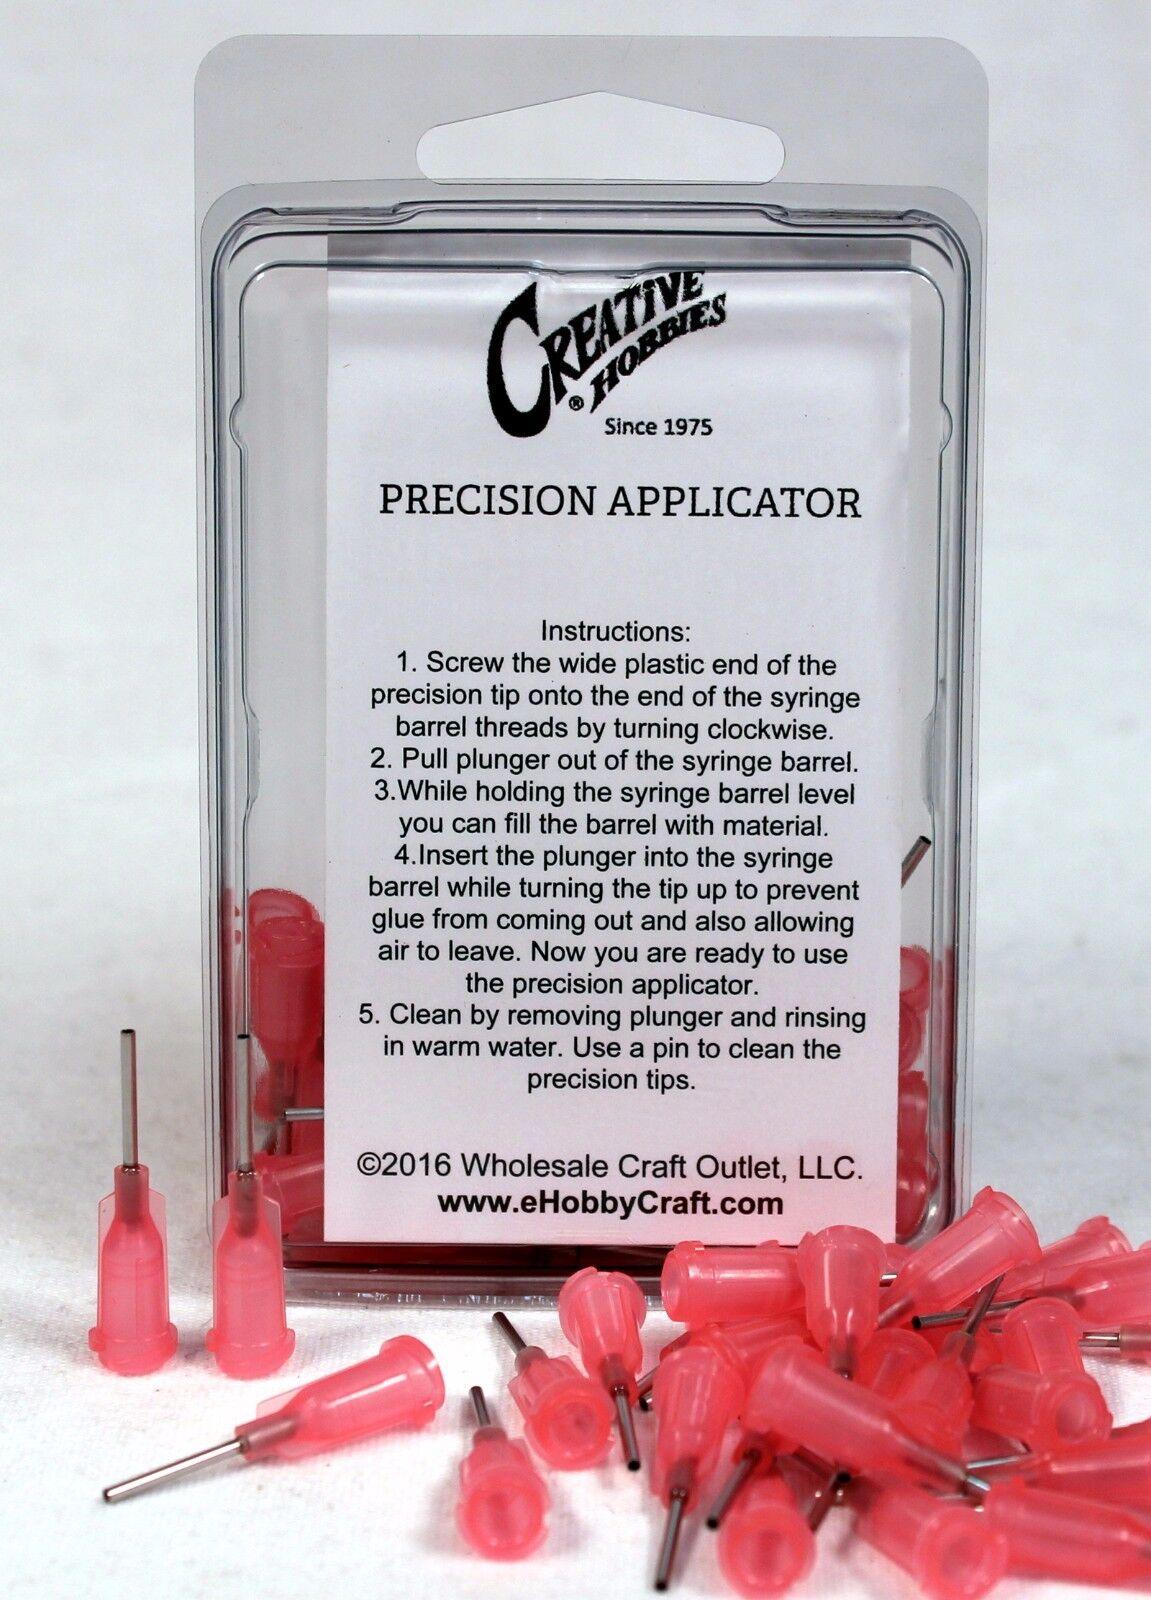 18 Gauge 0.5 Inch, Pink, Precision Applicator Dispensing Needle Tips, 50 Pieces Adhesive Guns & Dispensers